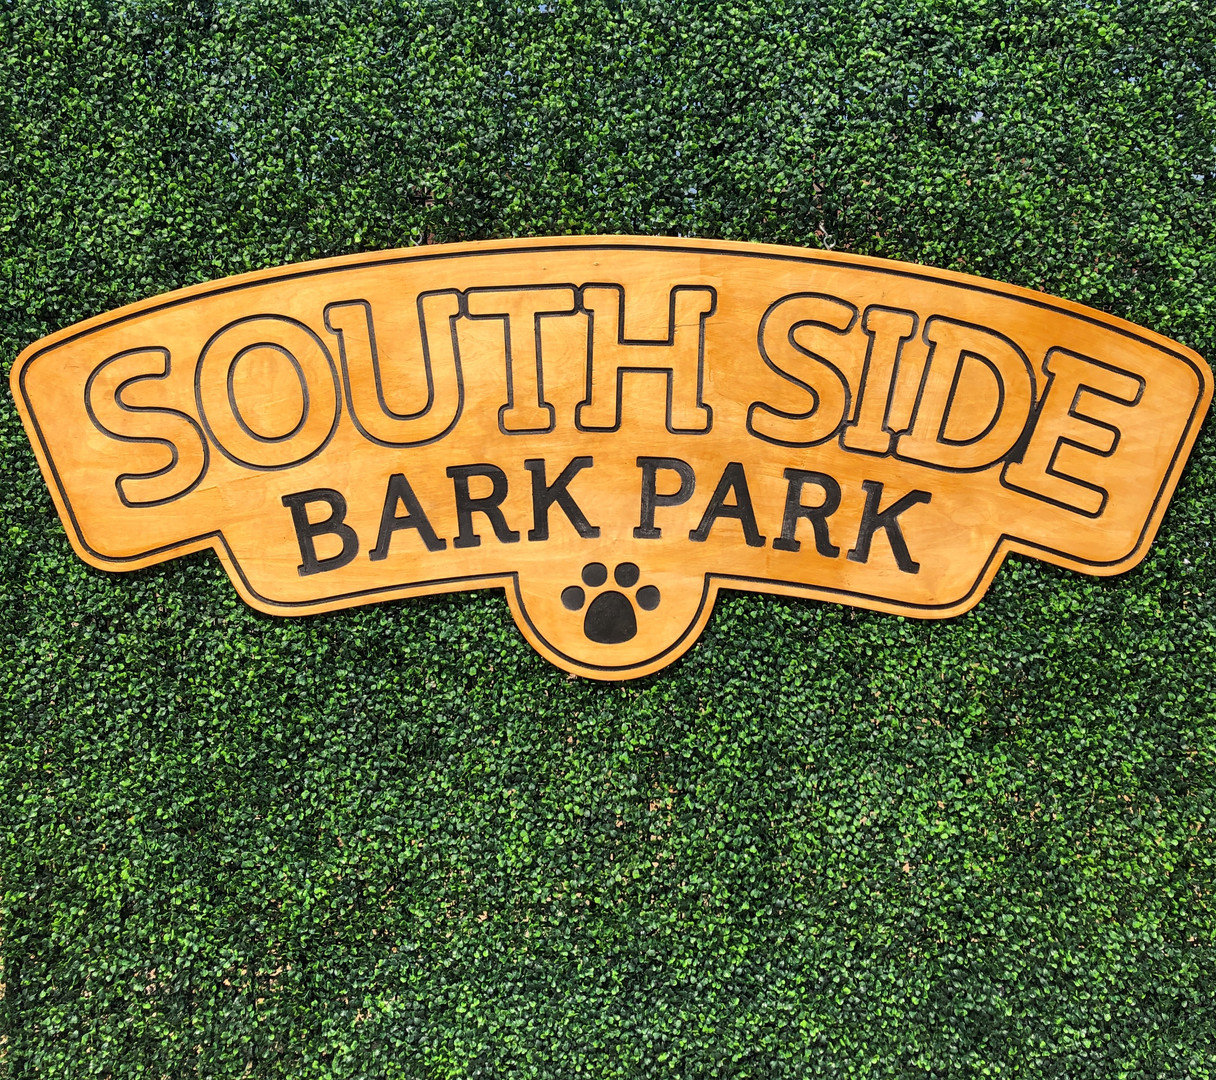 Southside Bark Park